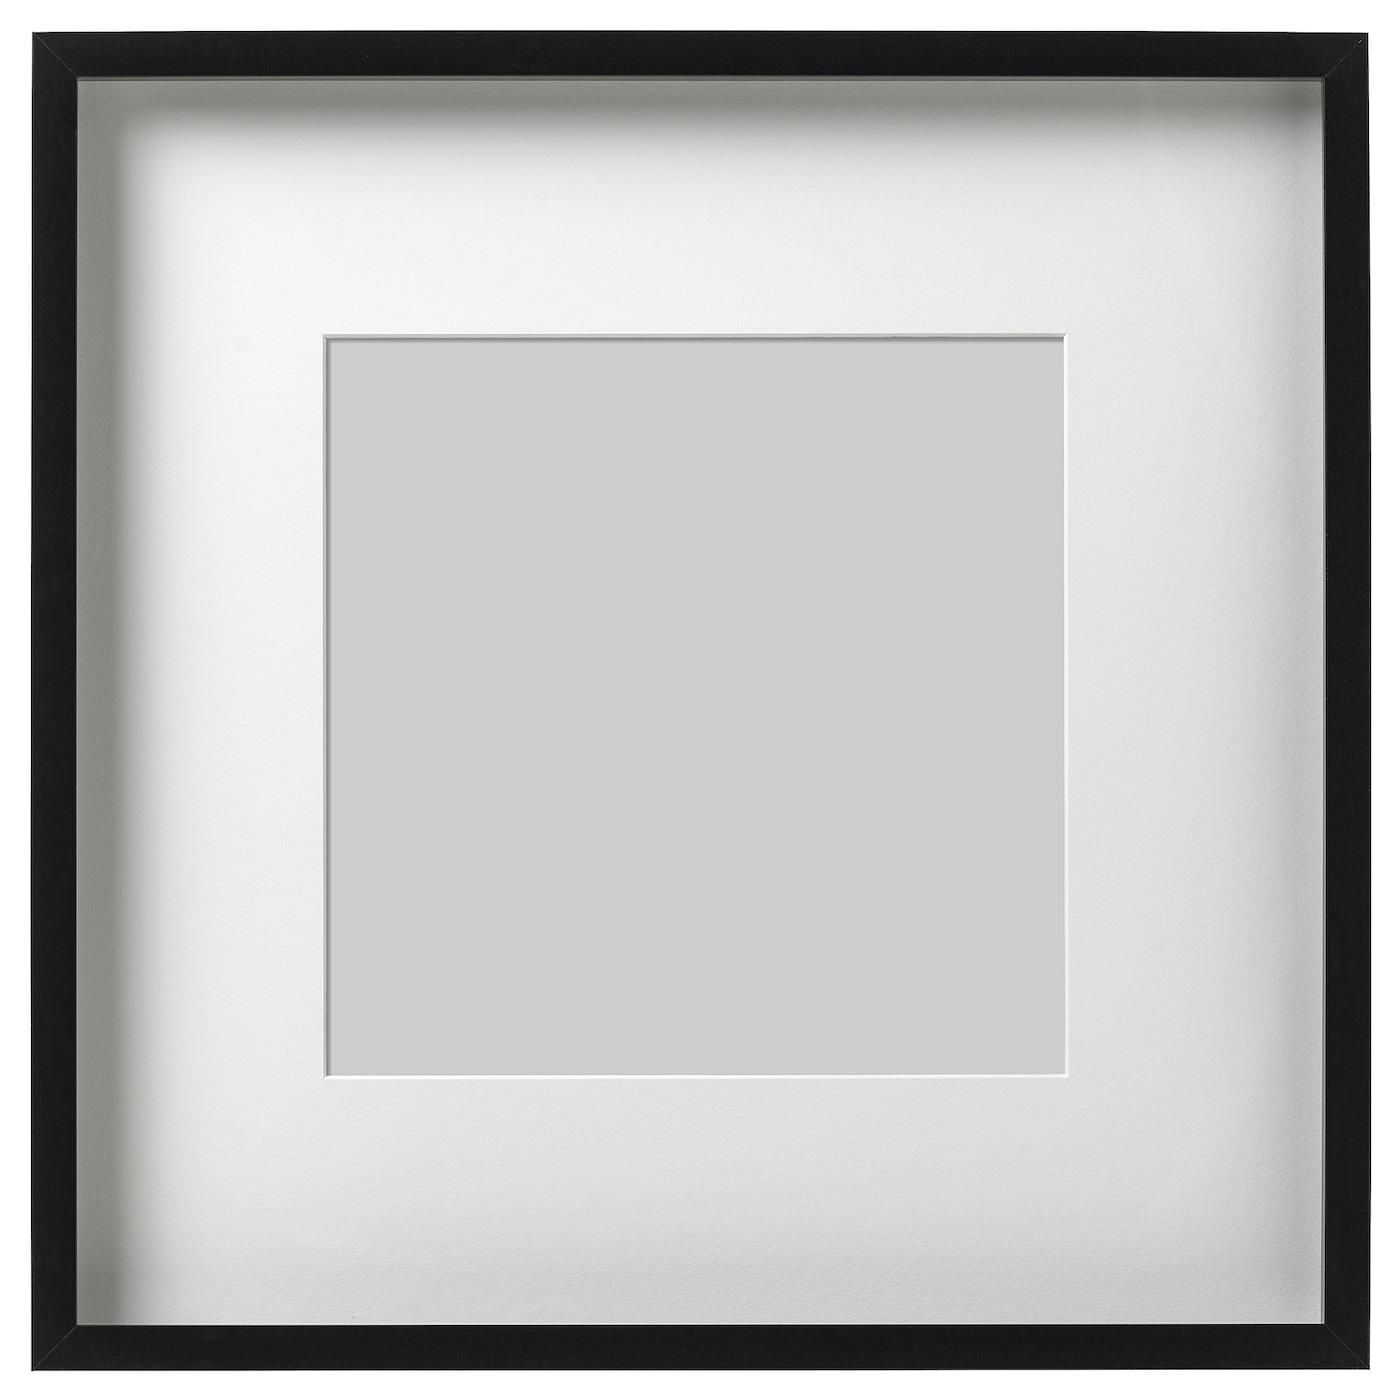 RIBBA Marco Negro 50 x 50 cm - IKEA